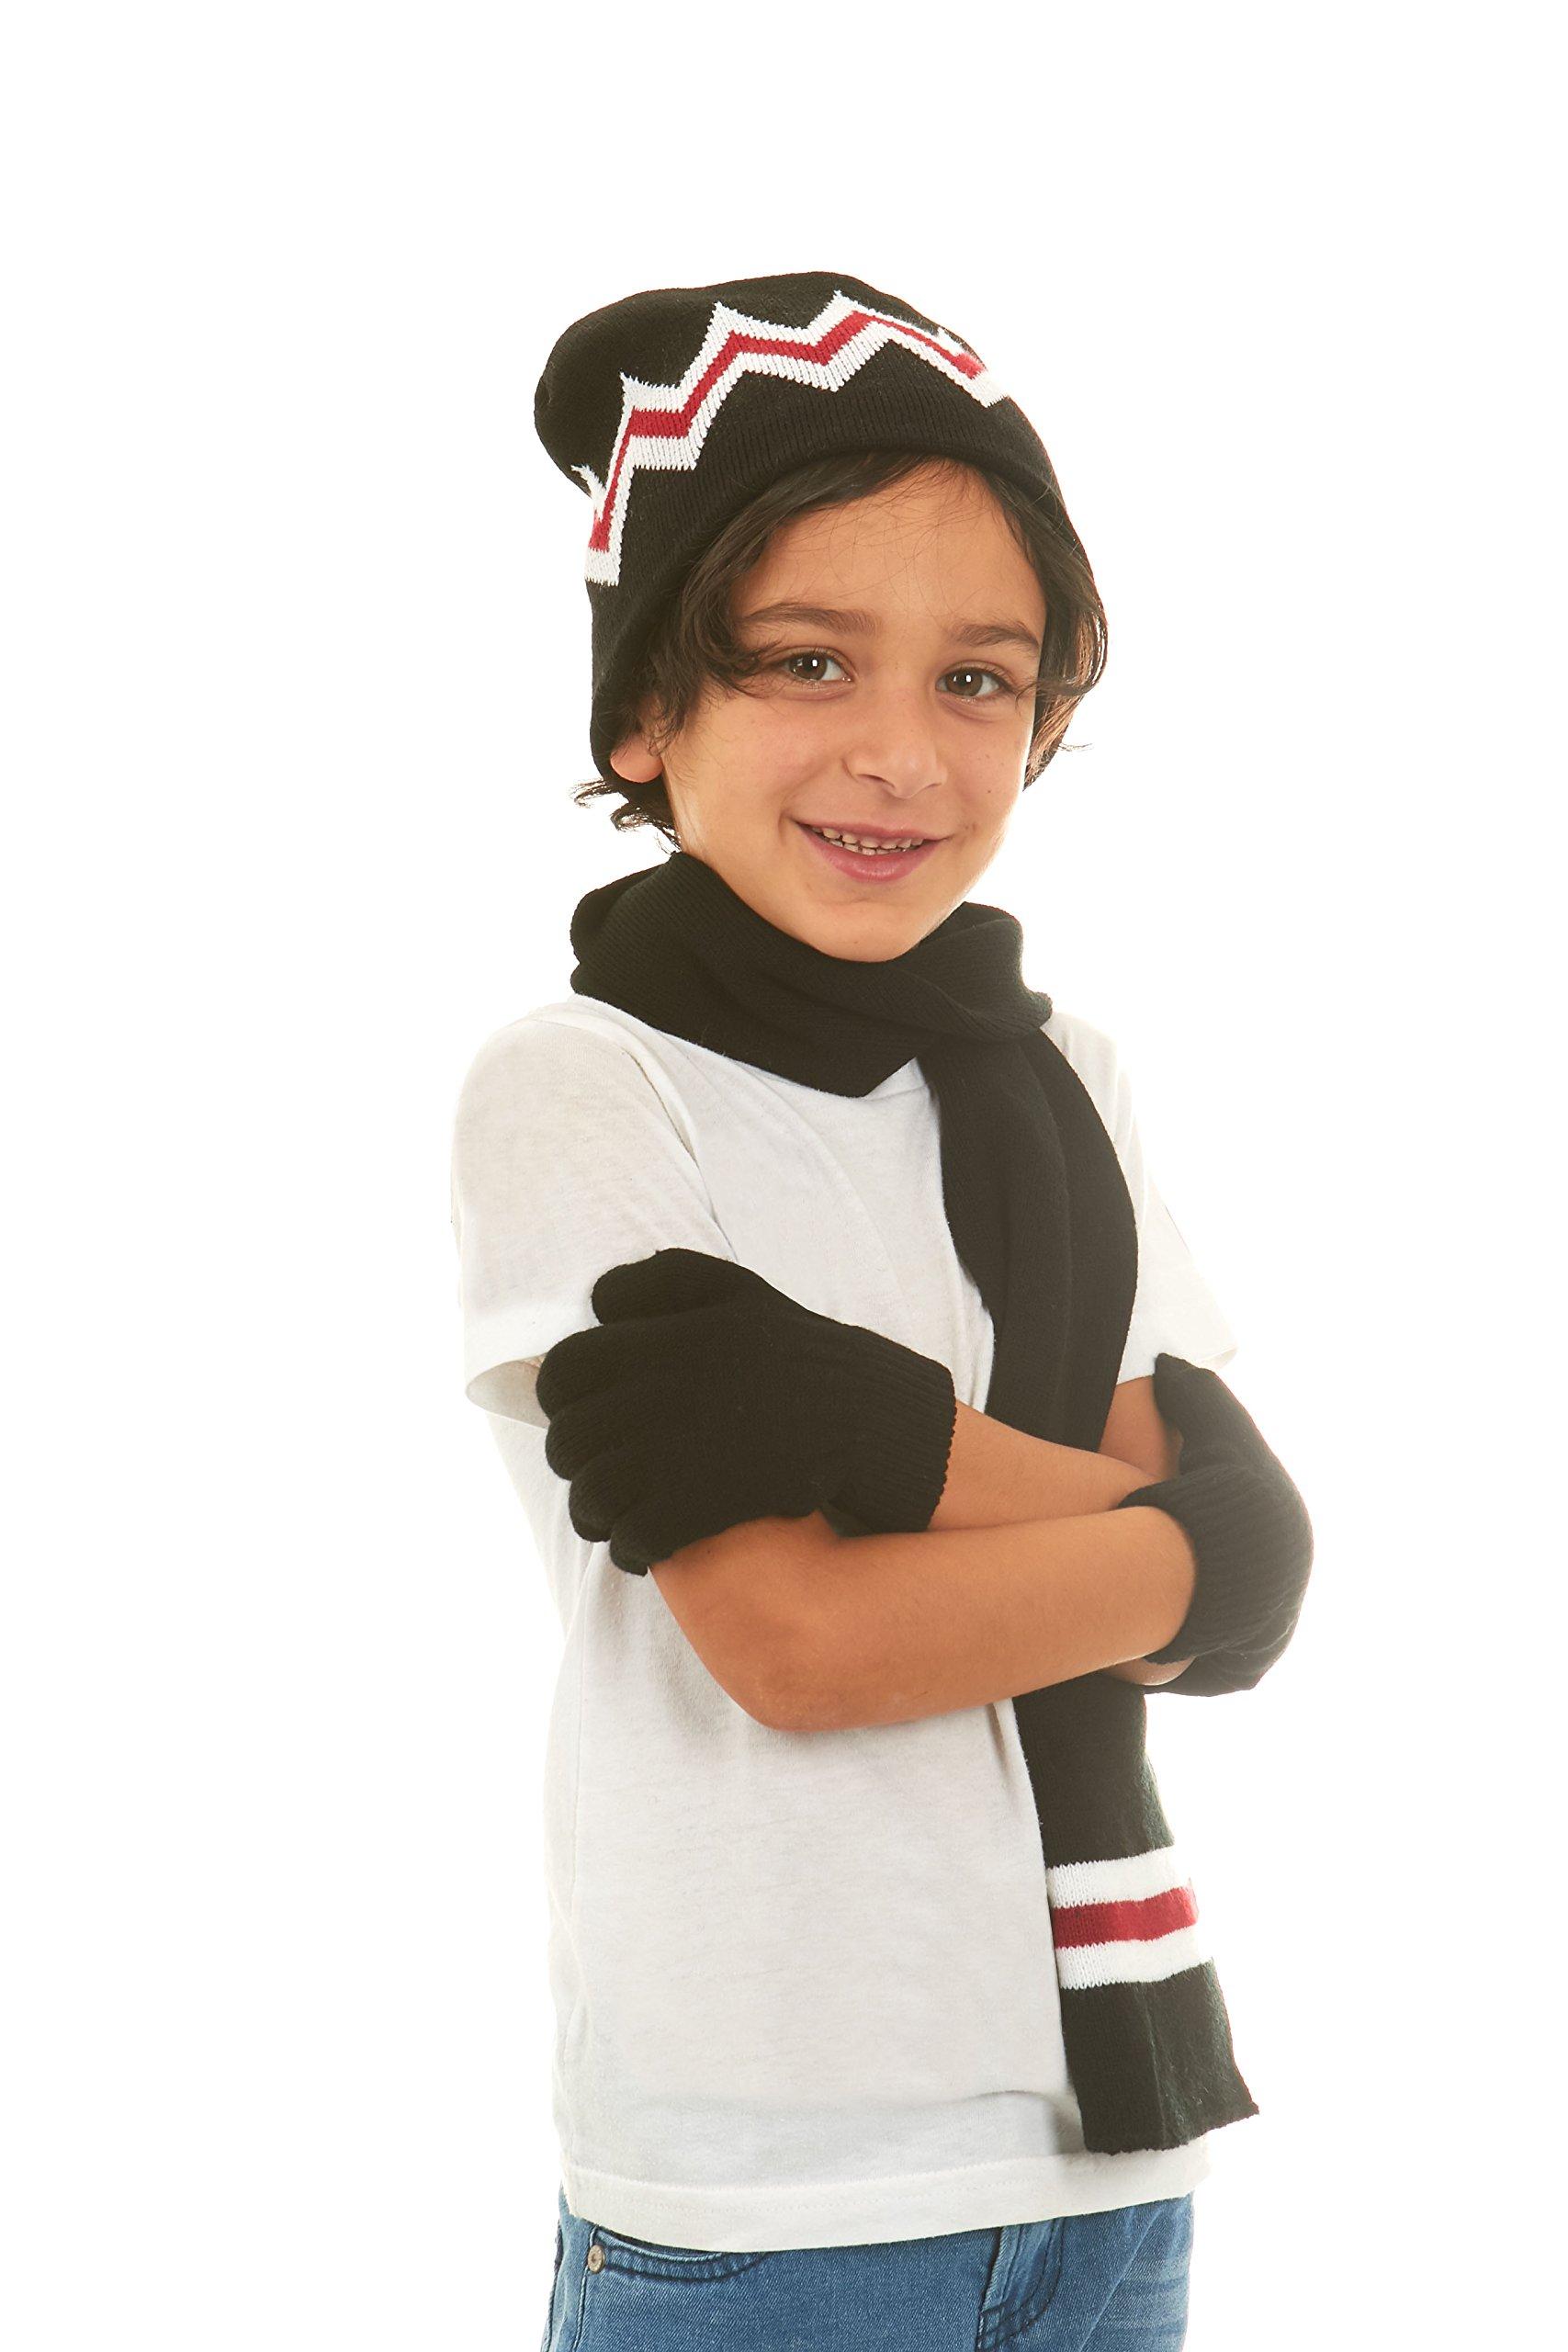 Polar Wear Boys Knit Hat, Scarf And Gloves Set - Black/Red by Polar Wear (Image #3)